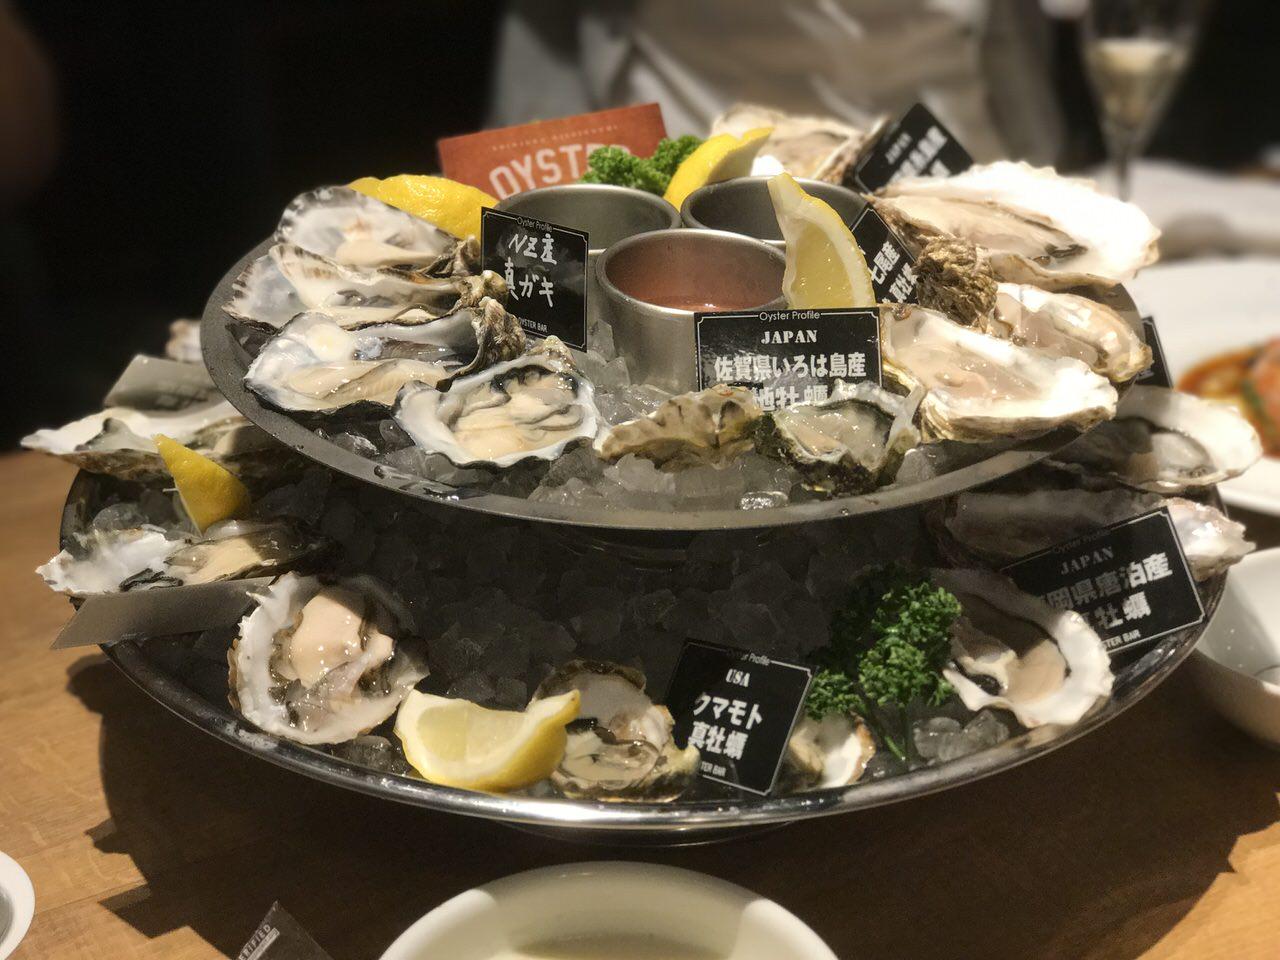 Shinjuku nishiguchi oyster bar 3229